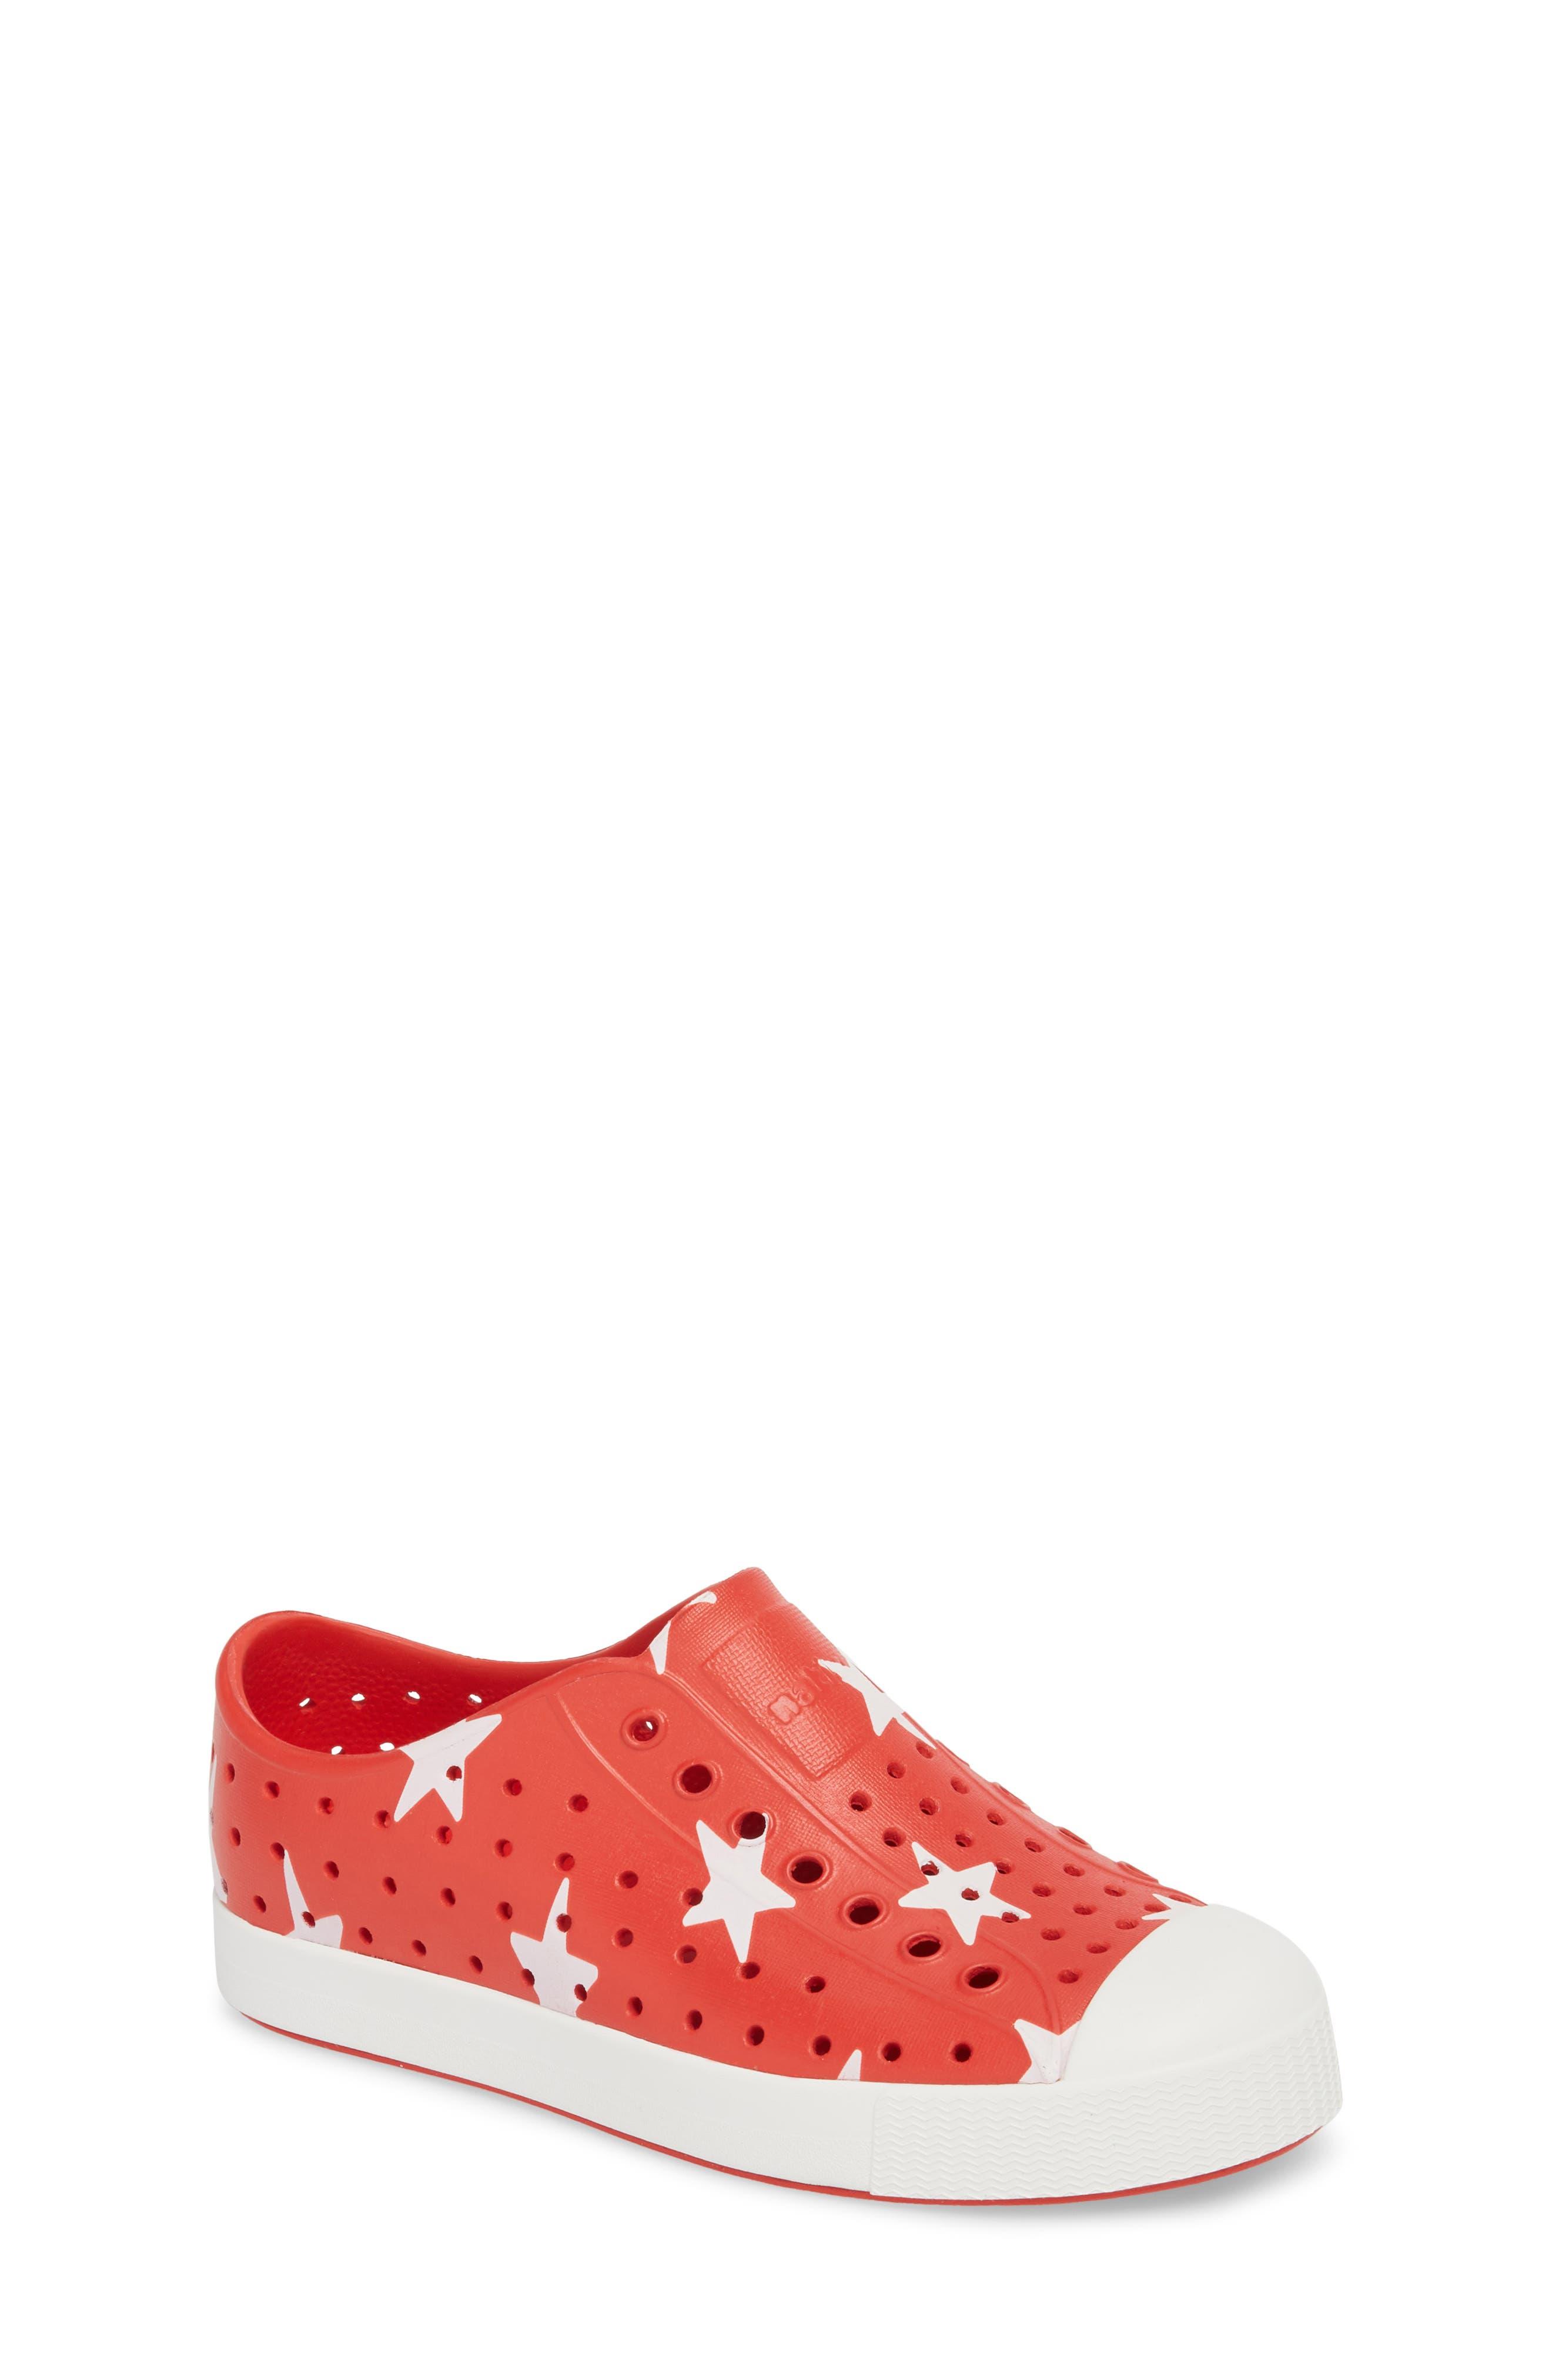 Image of Native Jefferson Waterproof Perforated Slip-On Sneaker